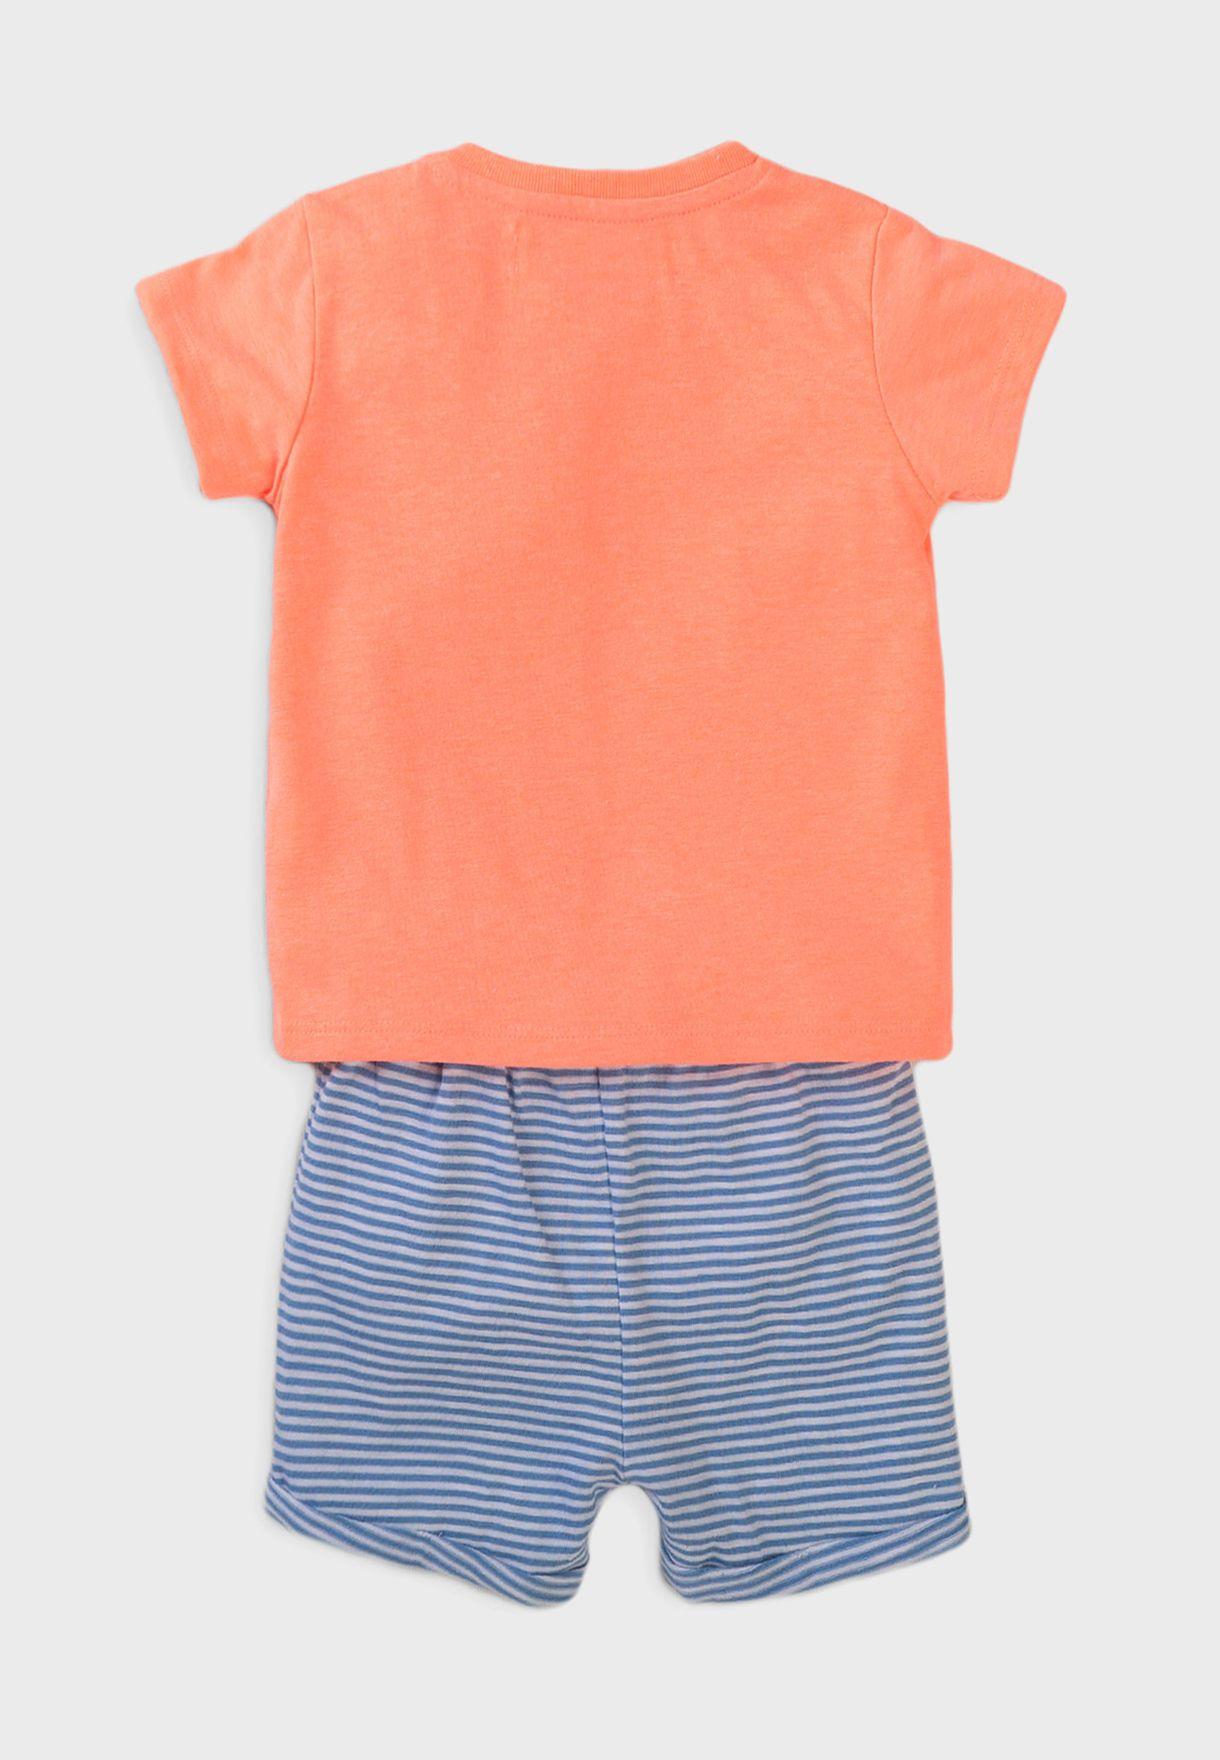 Infant T-Shirt + Striped Shorts Set